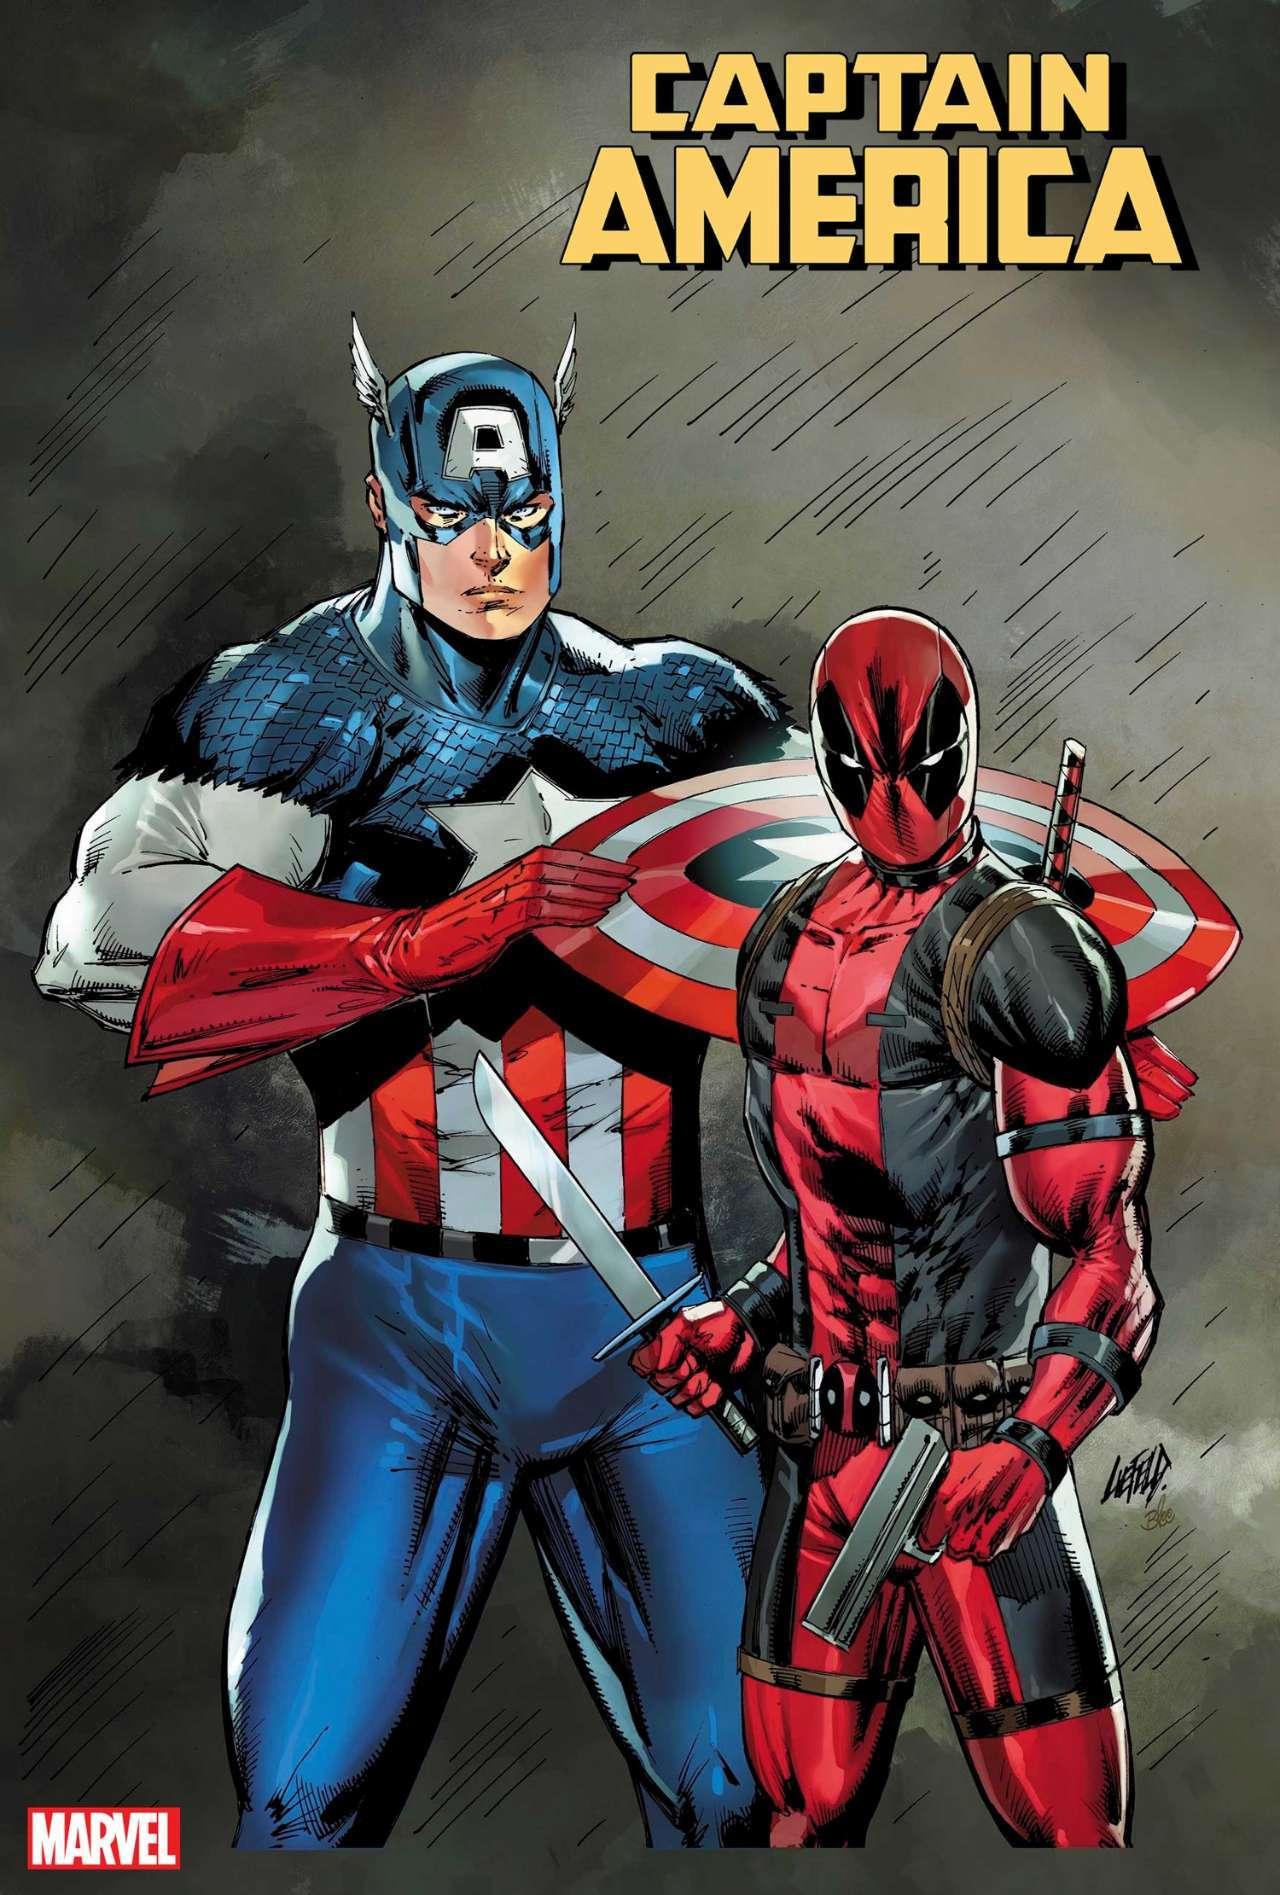 Liefeld_Deadpool30Cover_CaptainAmerica